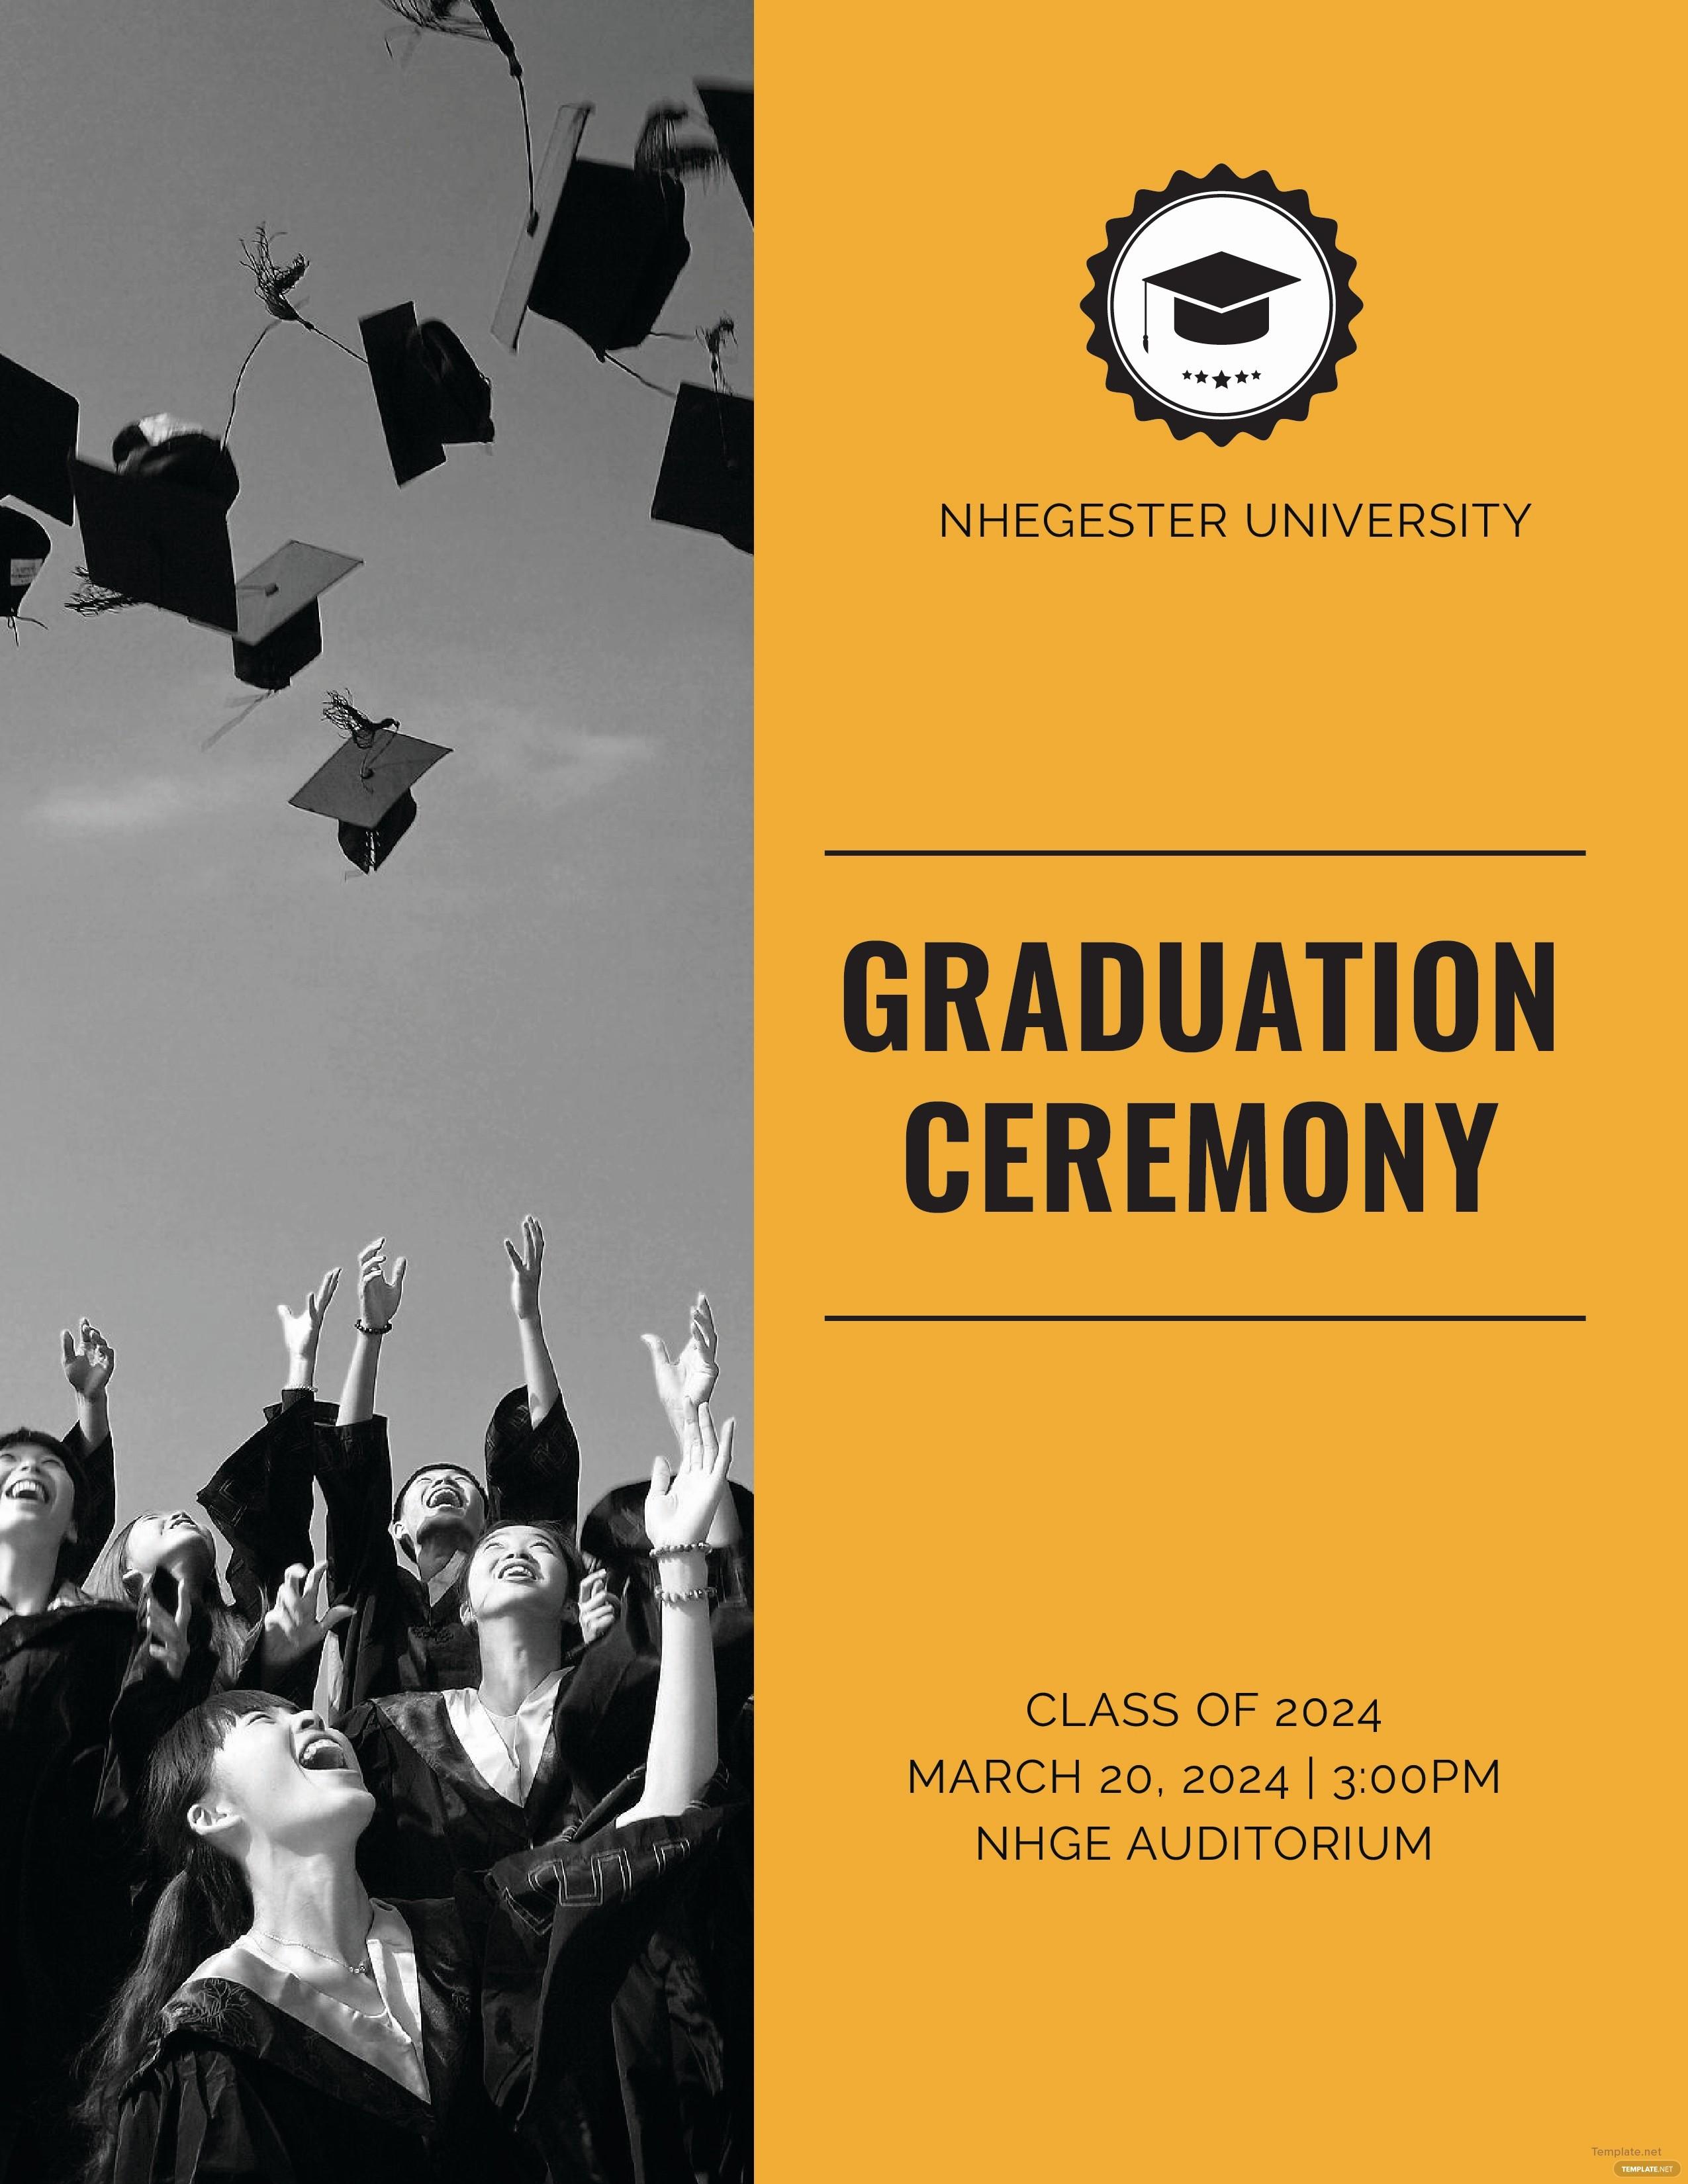 High School Graduation Program Template New Free Graduation Programs Template In Adobe Shop